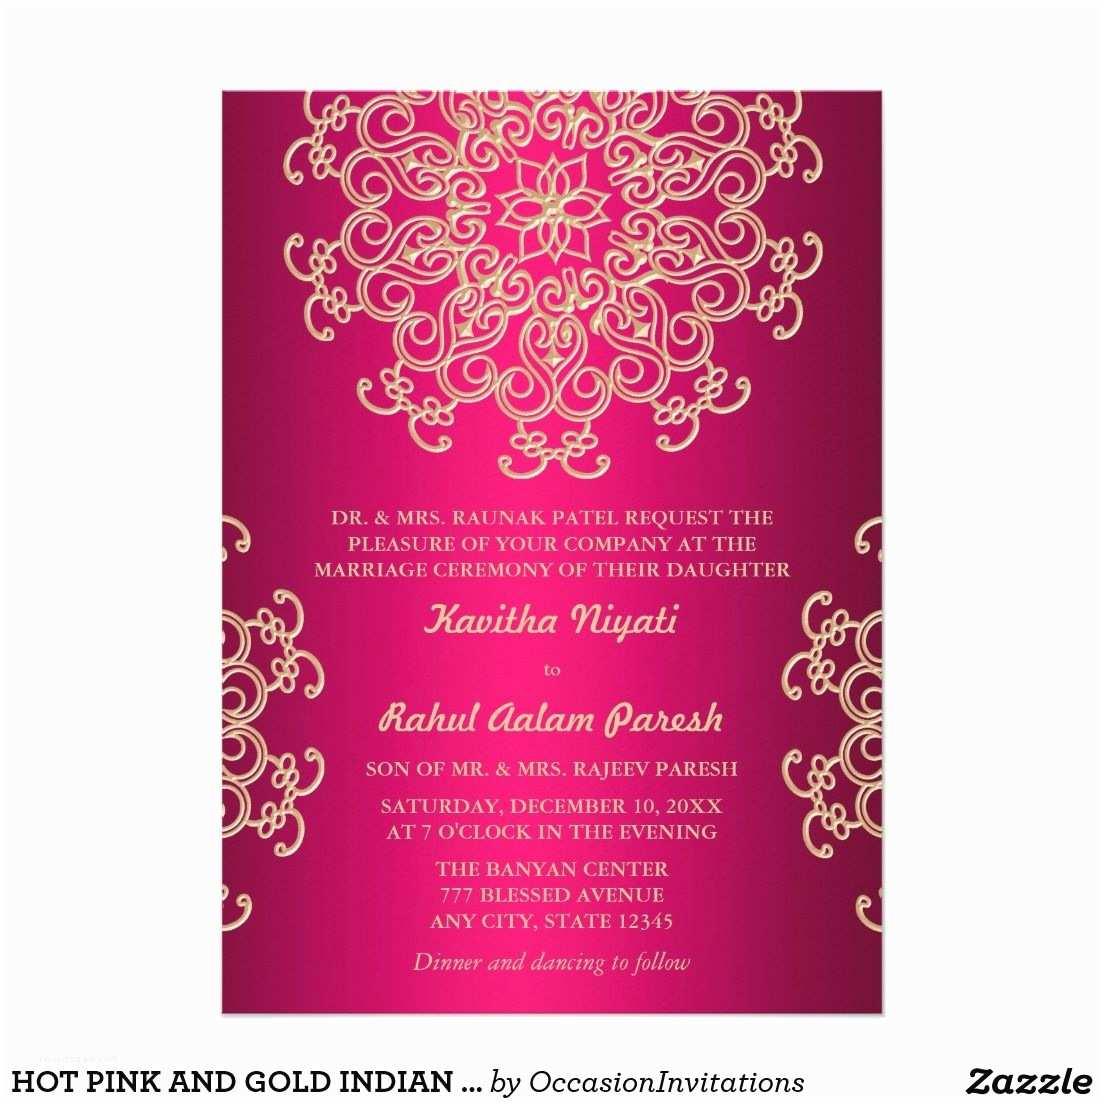 Hindu Wedding Invitations Hot Pink and Gold Indian Style Wedding Invitation